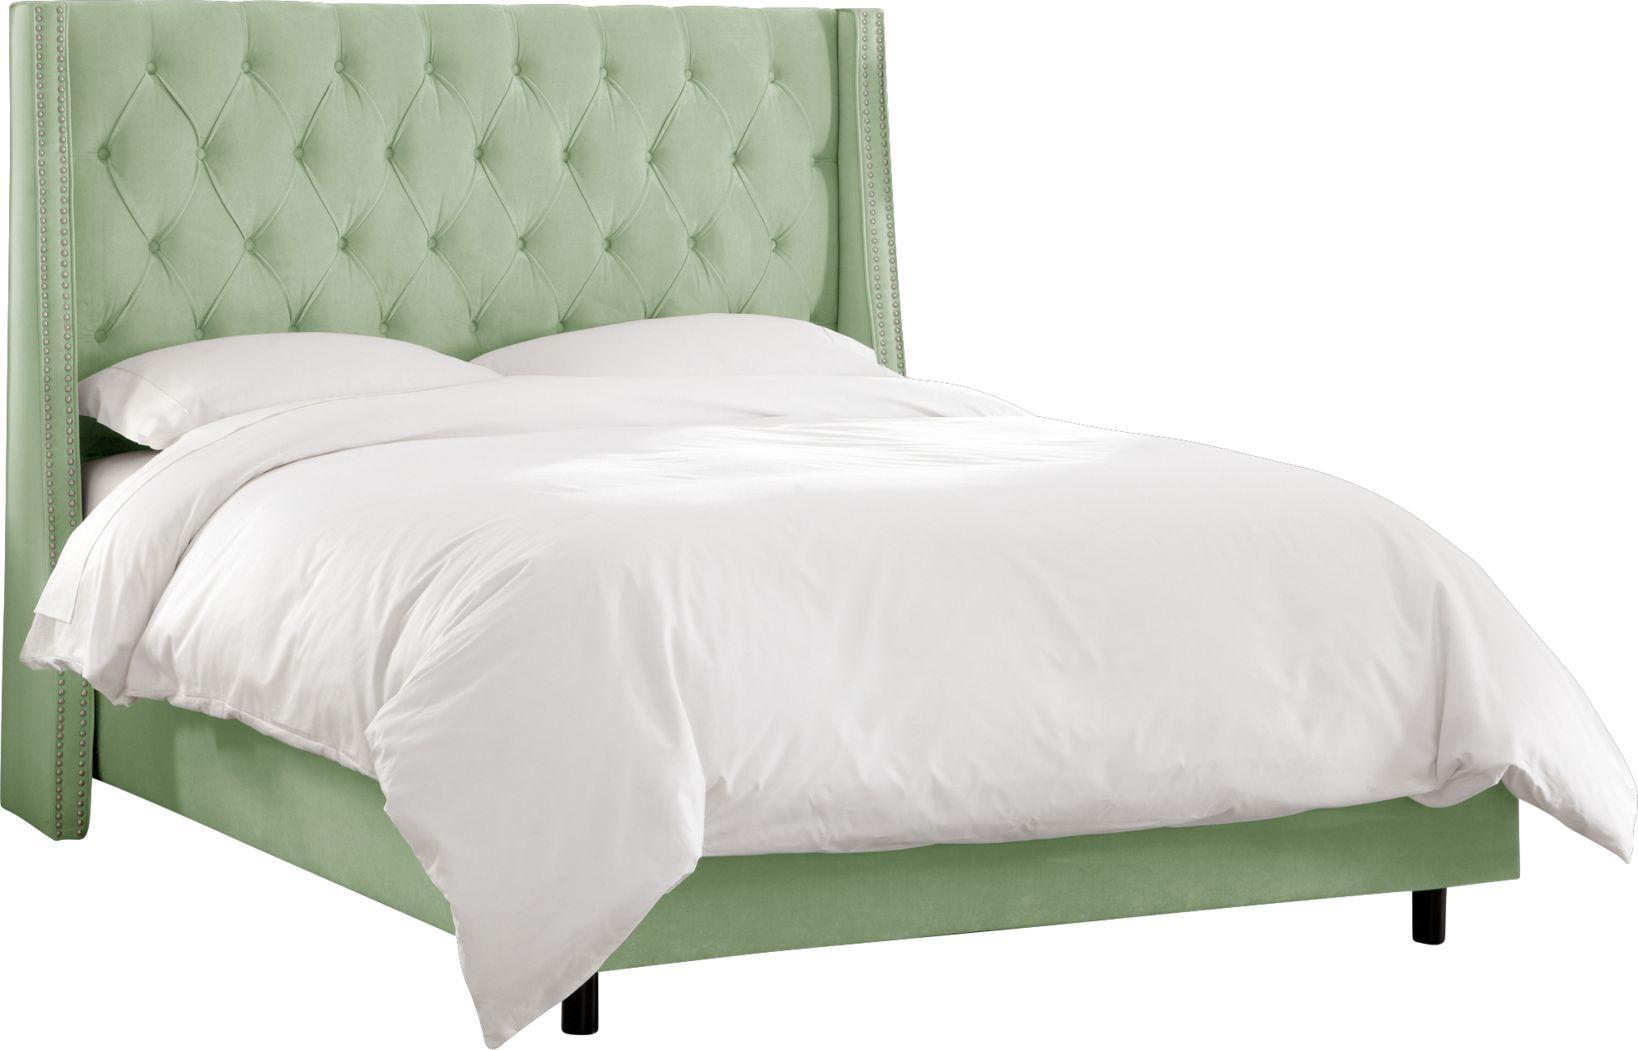 Garonne Green King Bed